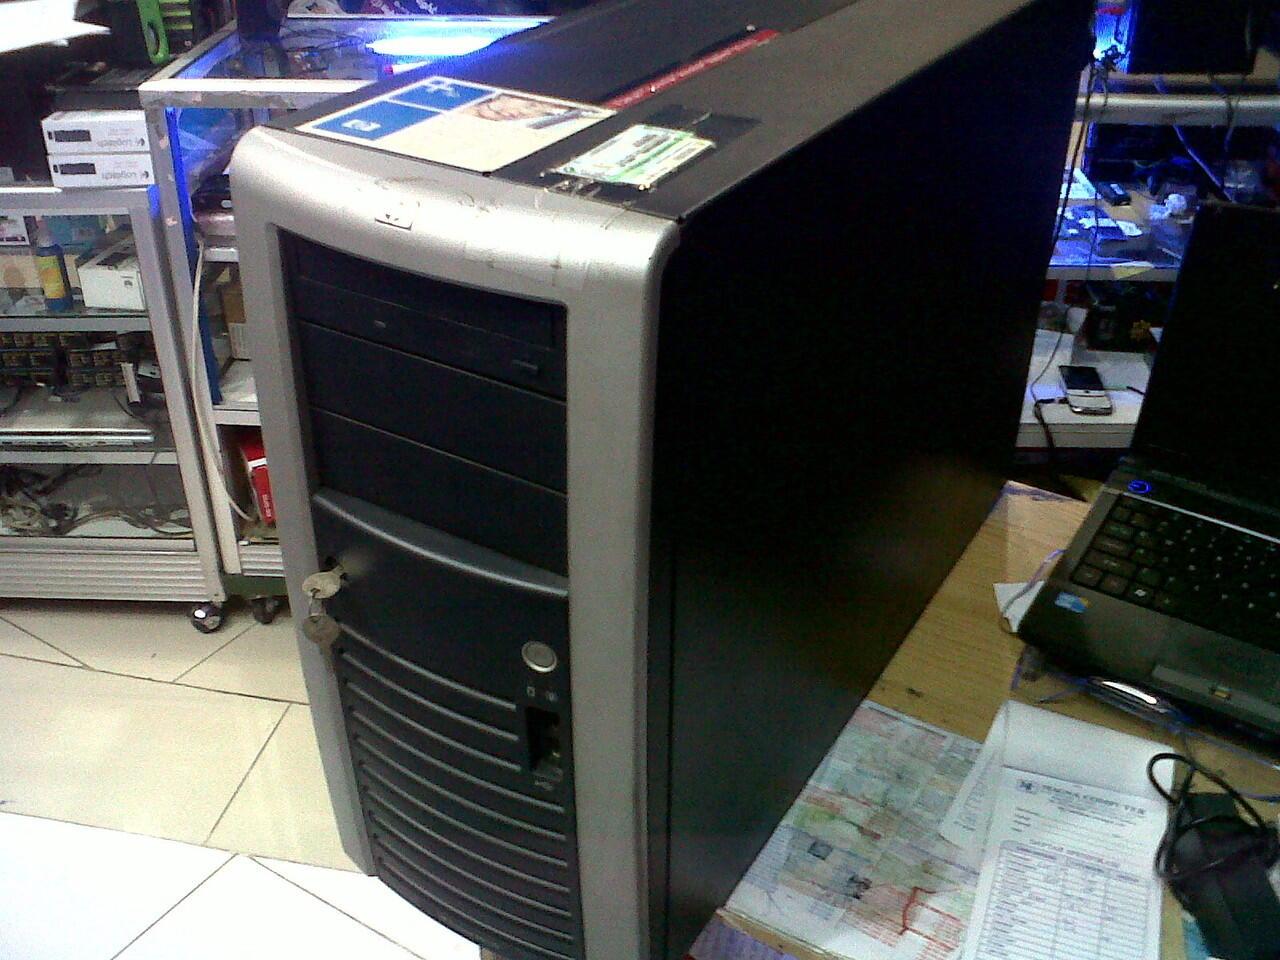 30bd0f4d644 Terjual JUAL PC SERVER Hp Proliant ML150 Include Win Server 2003 ...